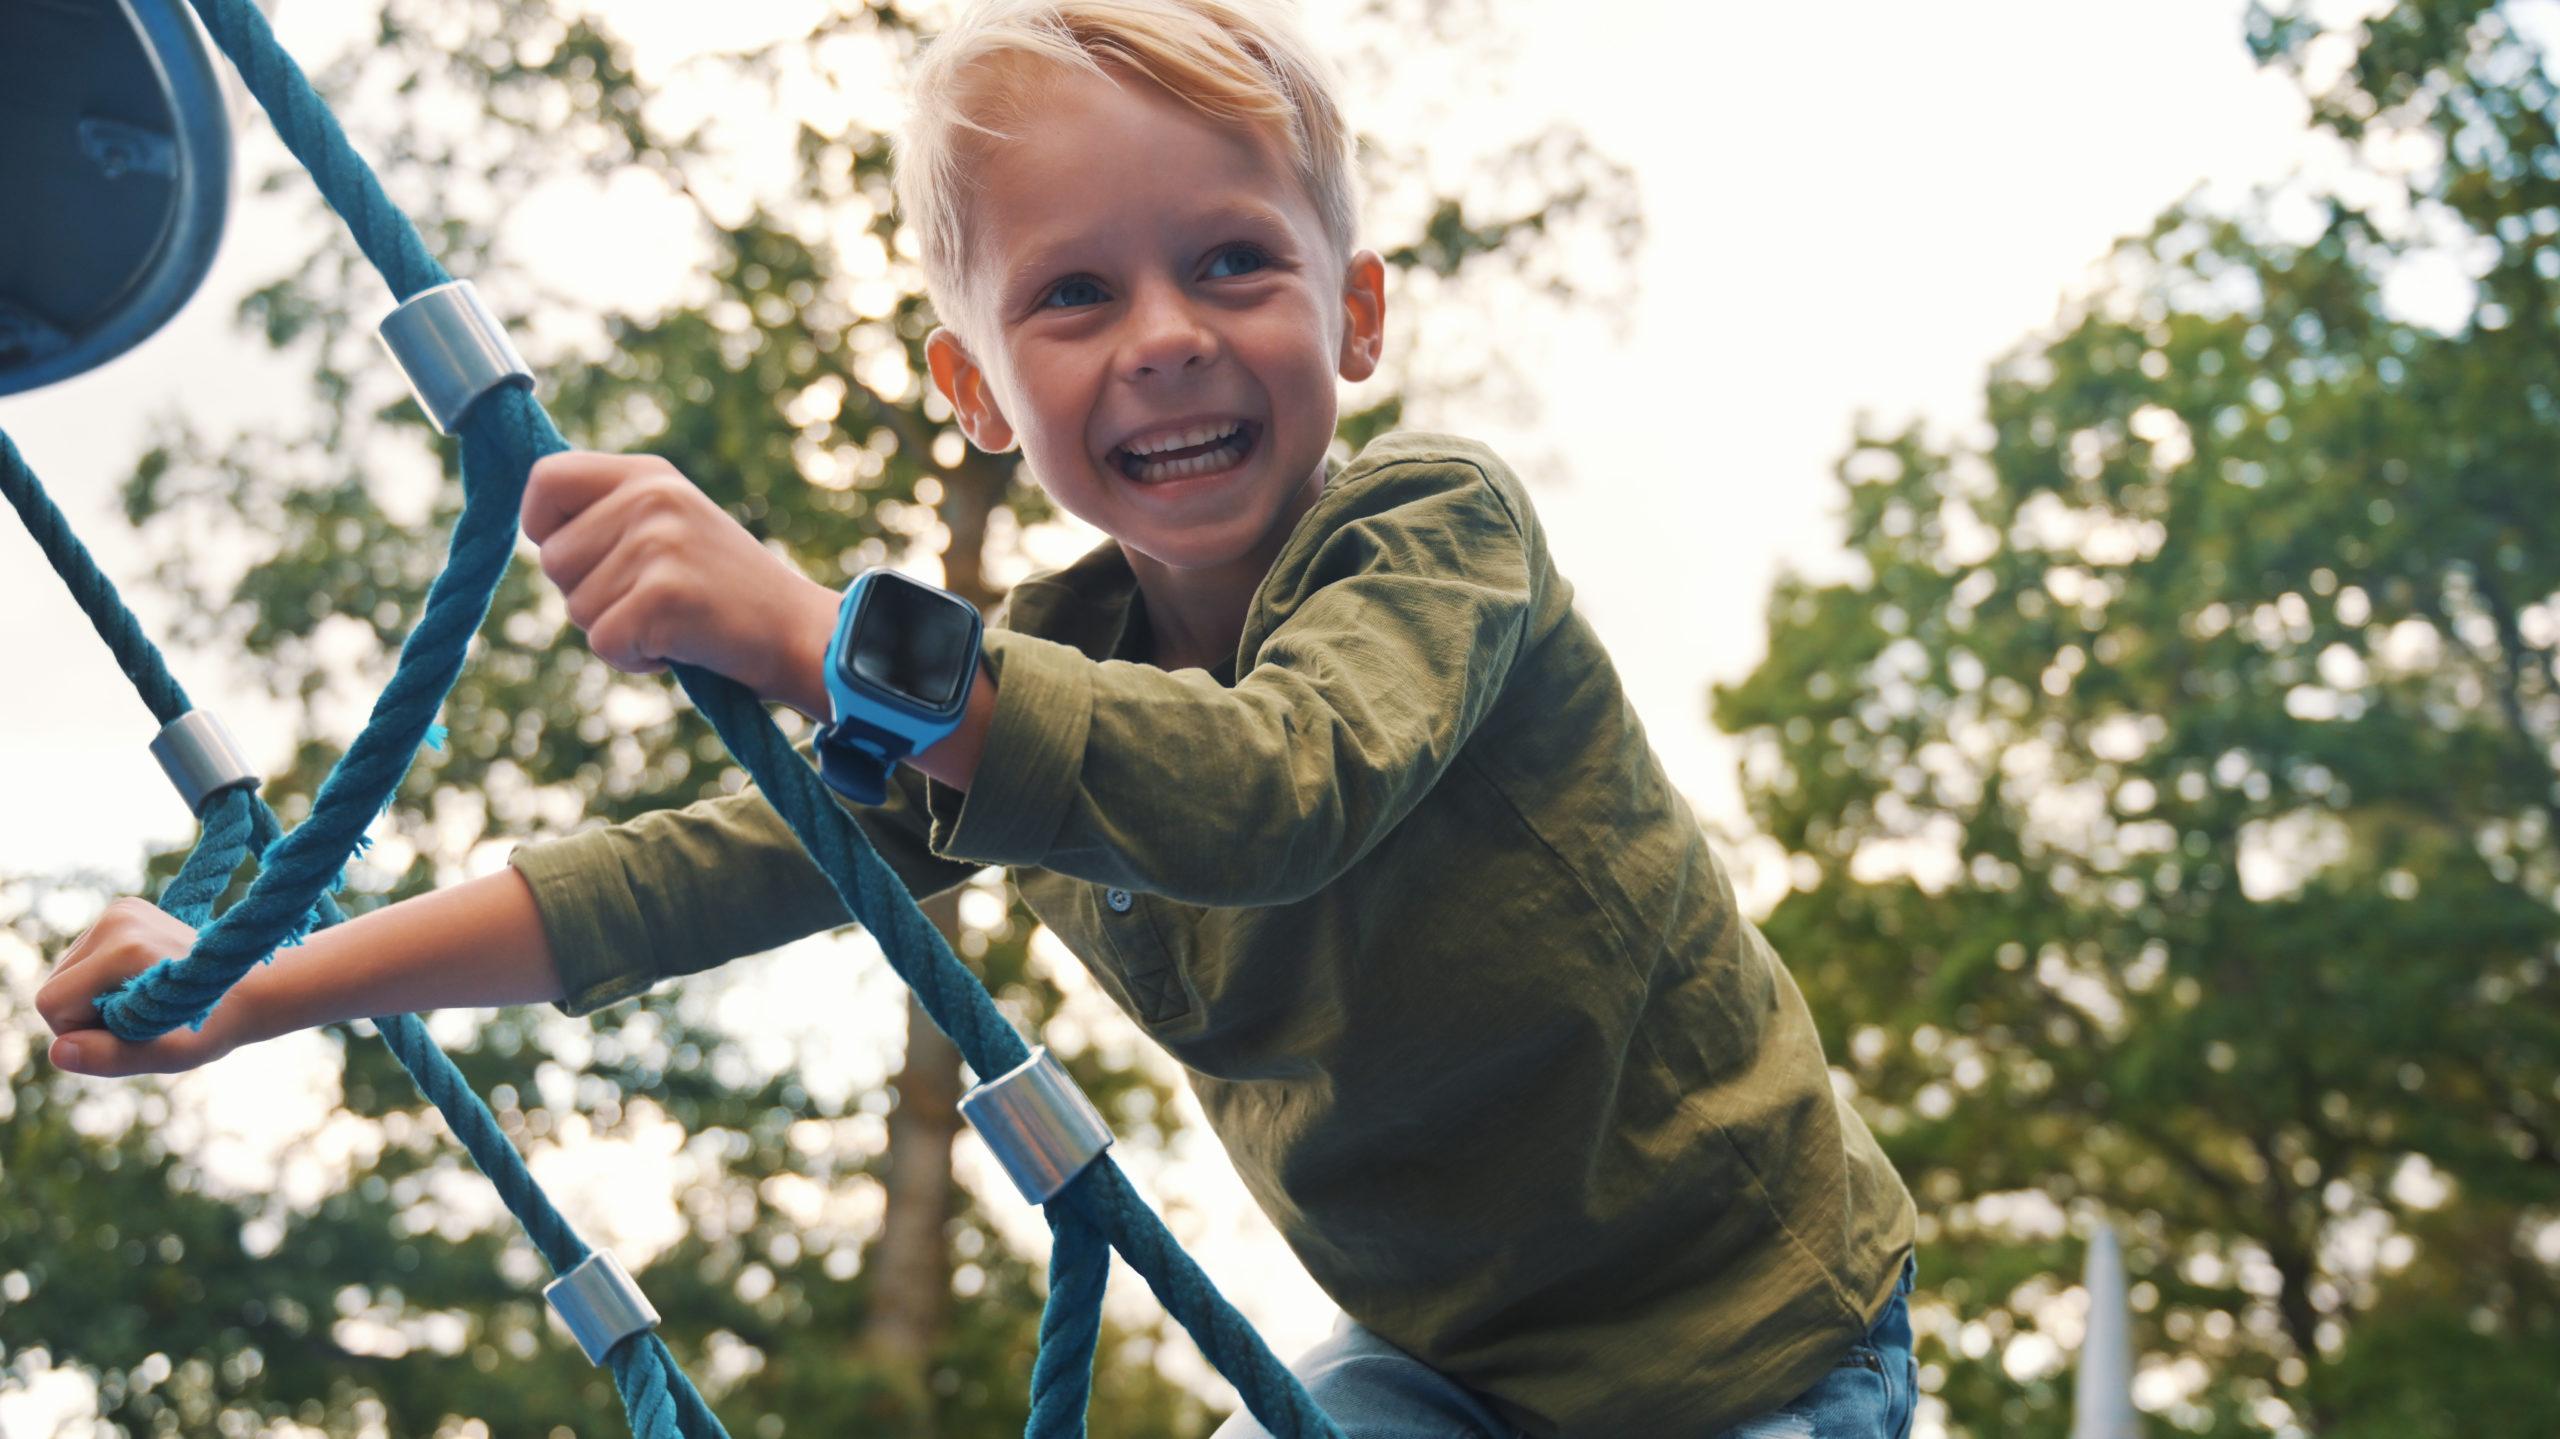 barn-med-blå-xplora-x4-ute